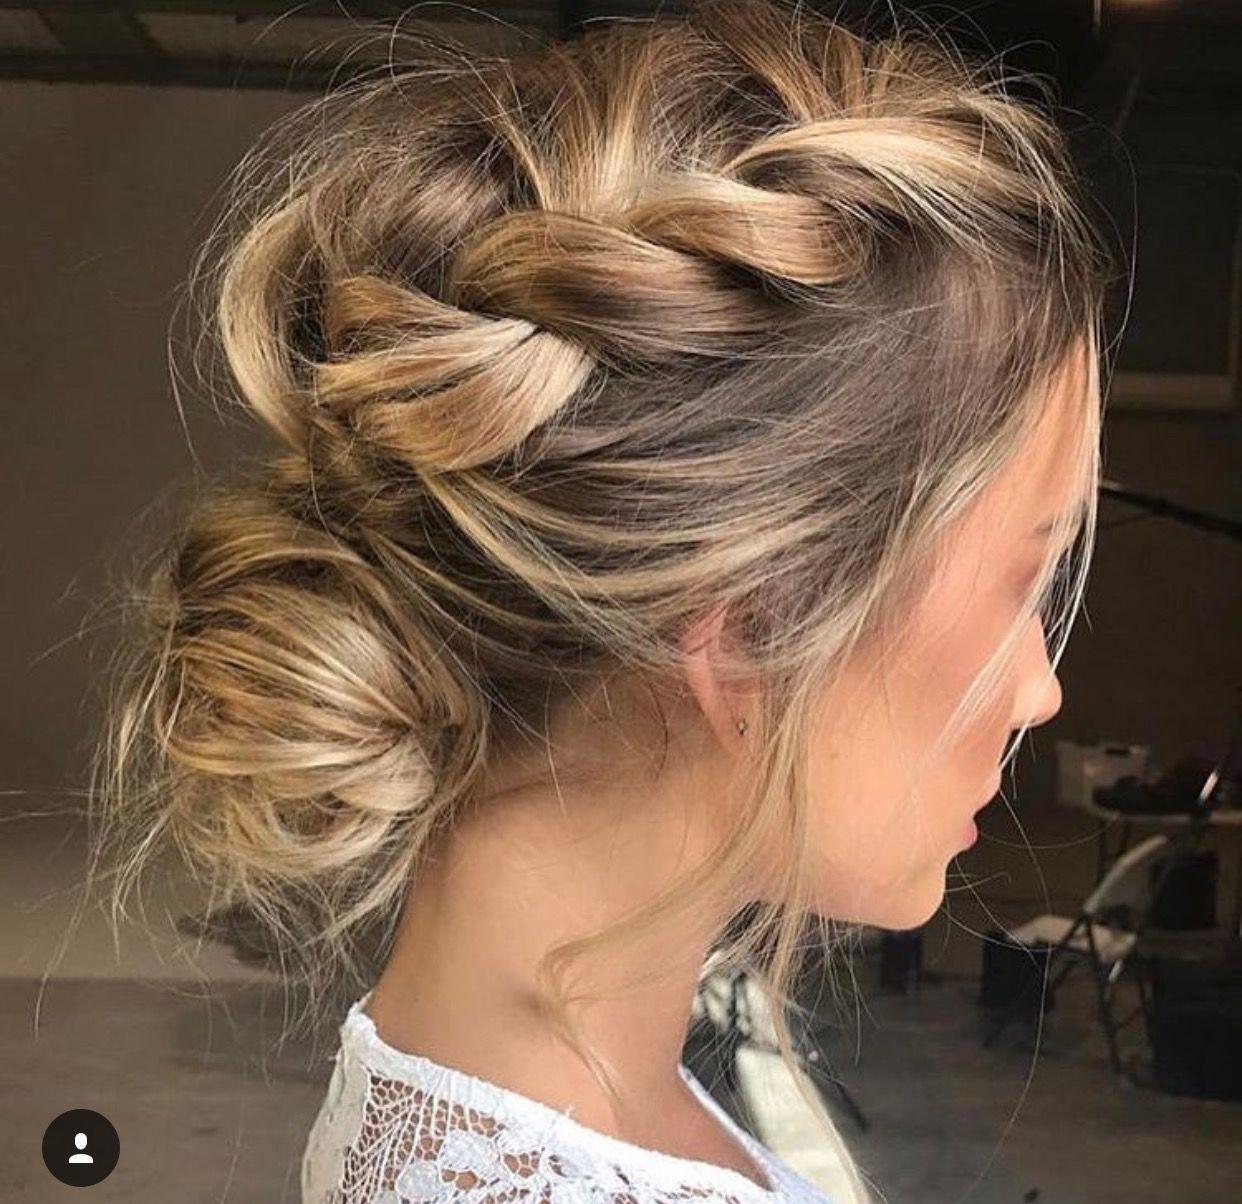 Pin by sandra castejon on fashion pinterest hair style makeup